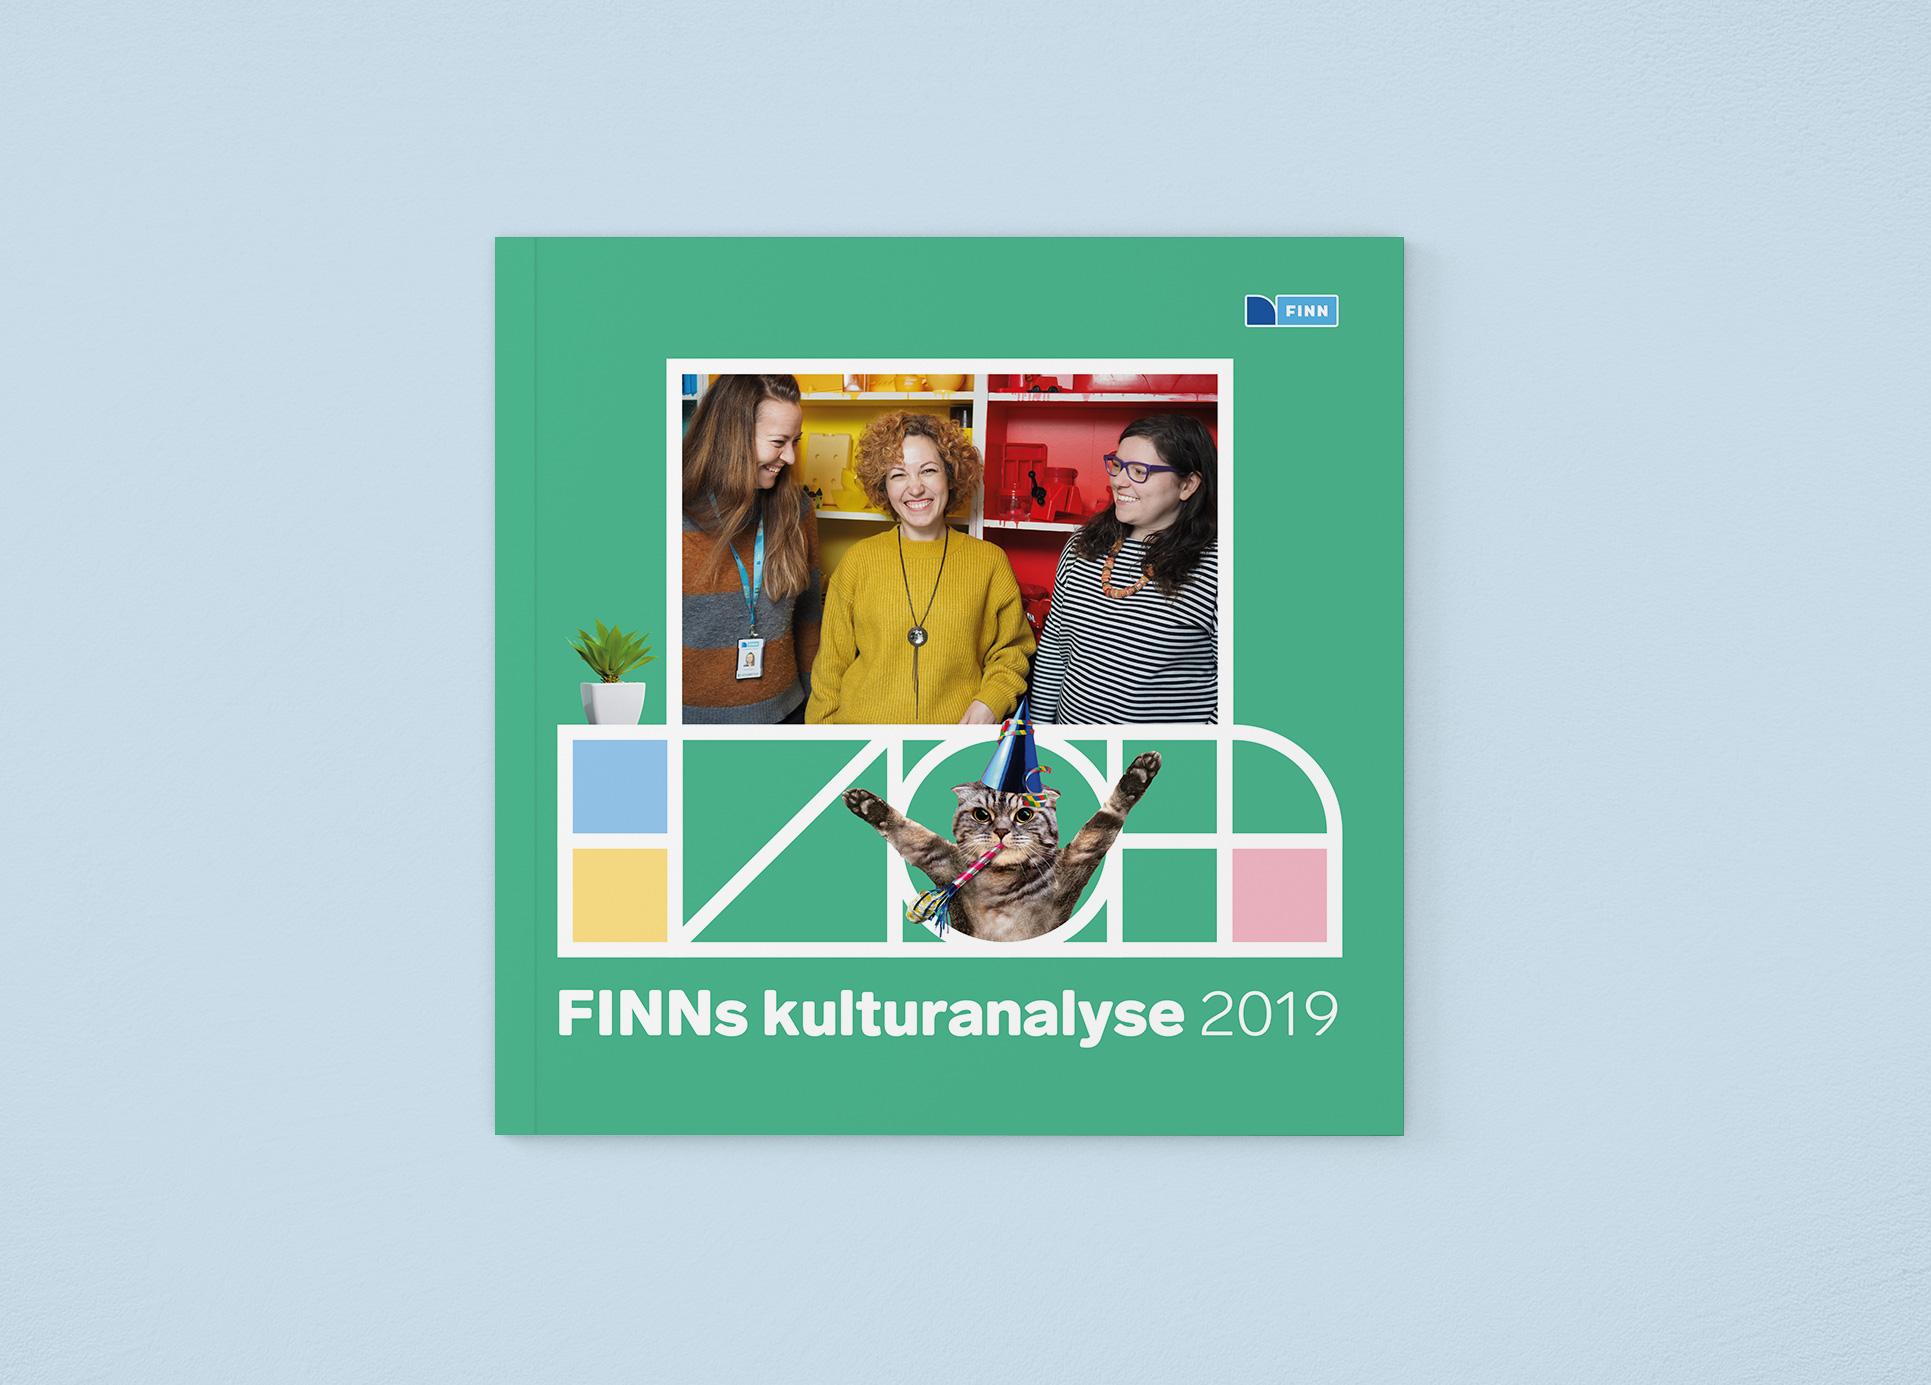 FINN_CultureAudit2019